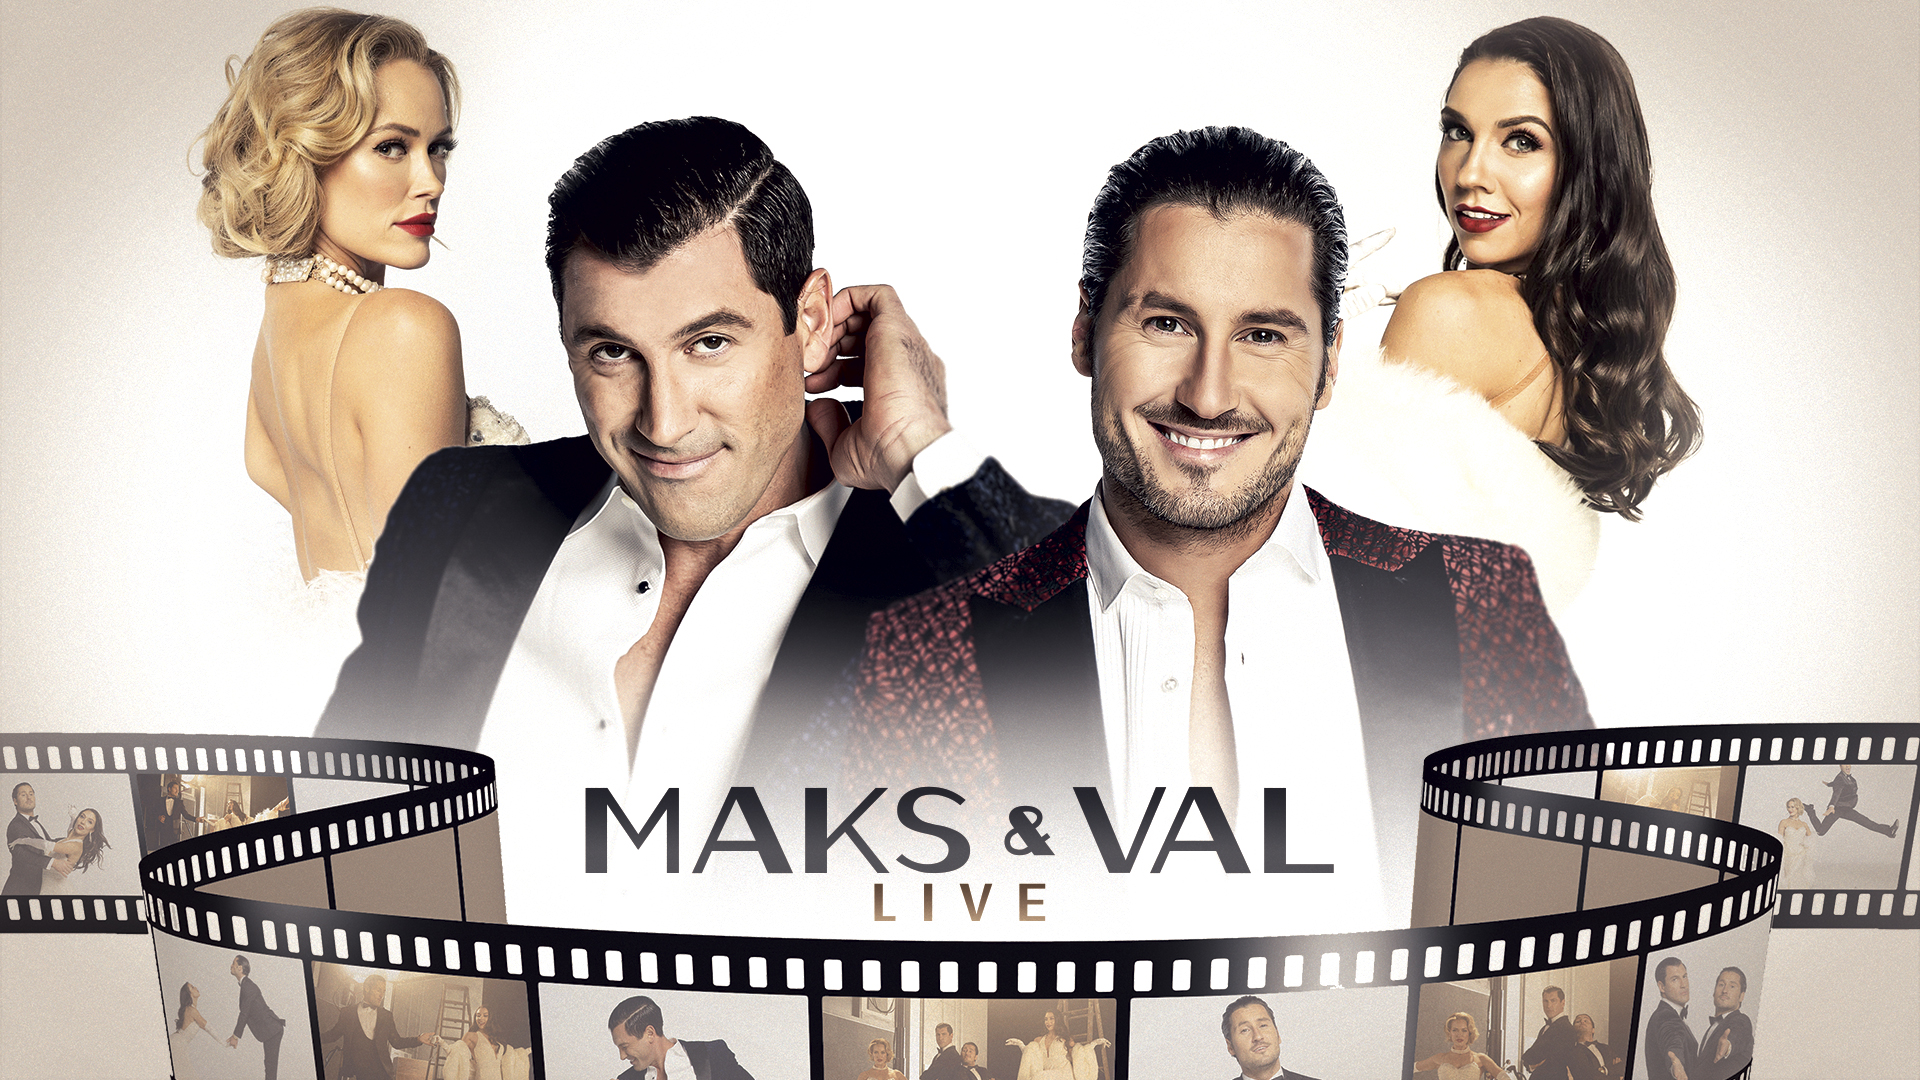 Maks & Val Live